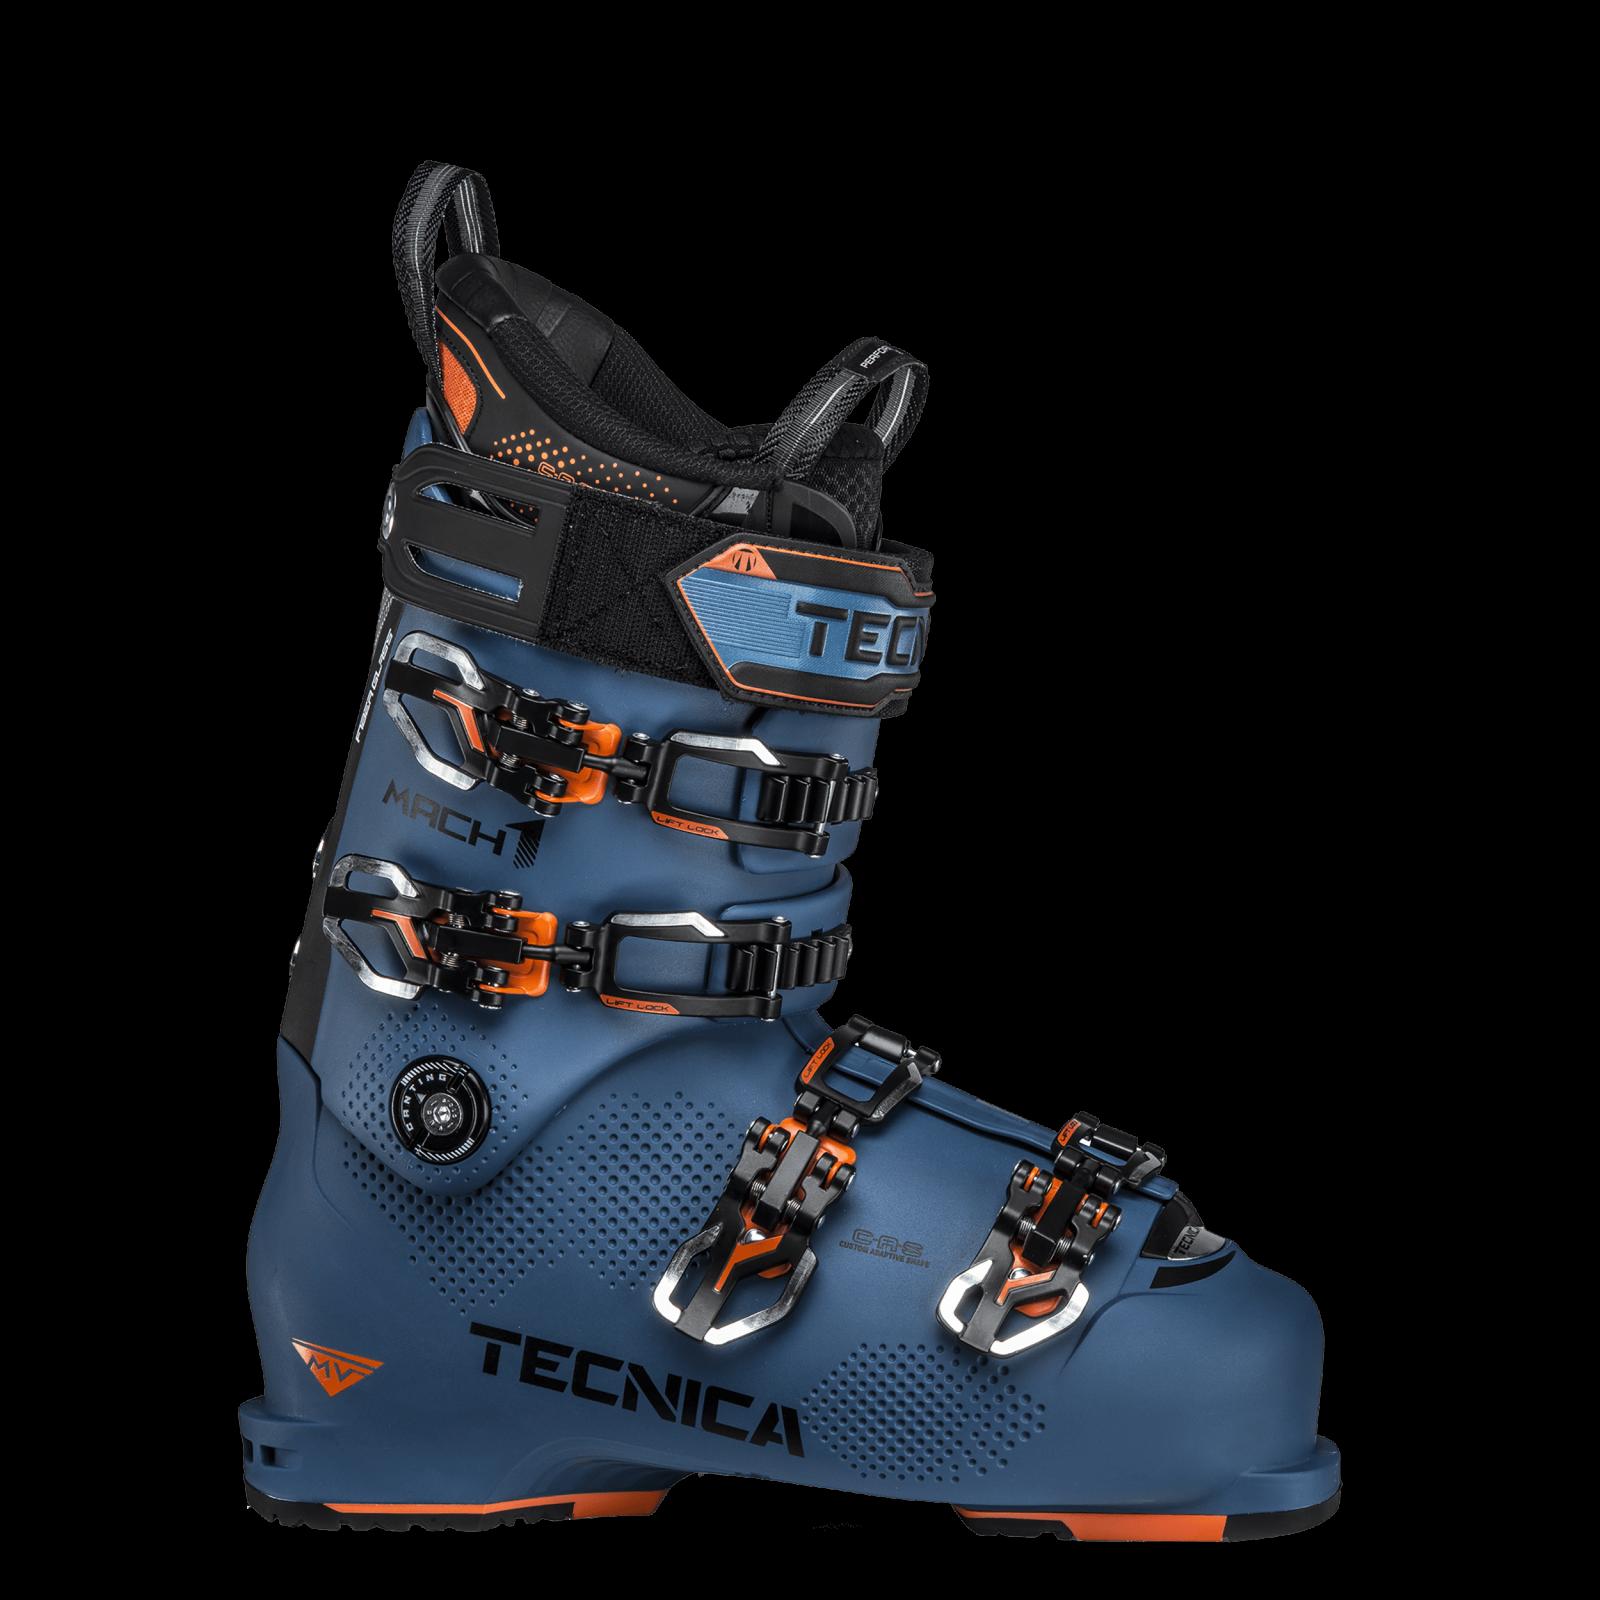 Tecnica Mach1 MV 120 Ski Boots 2021